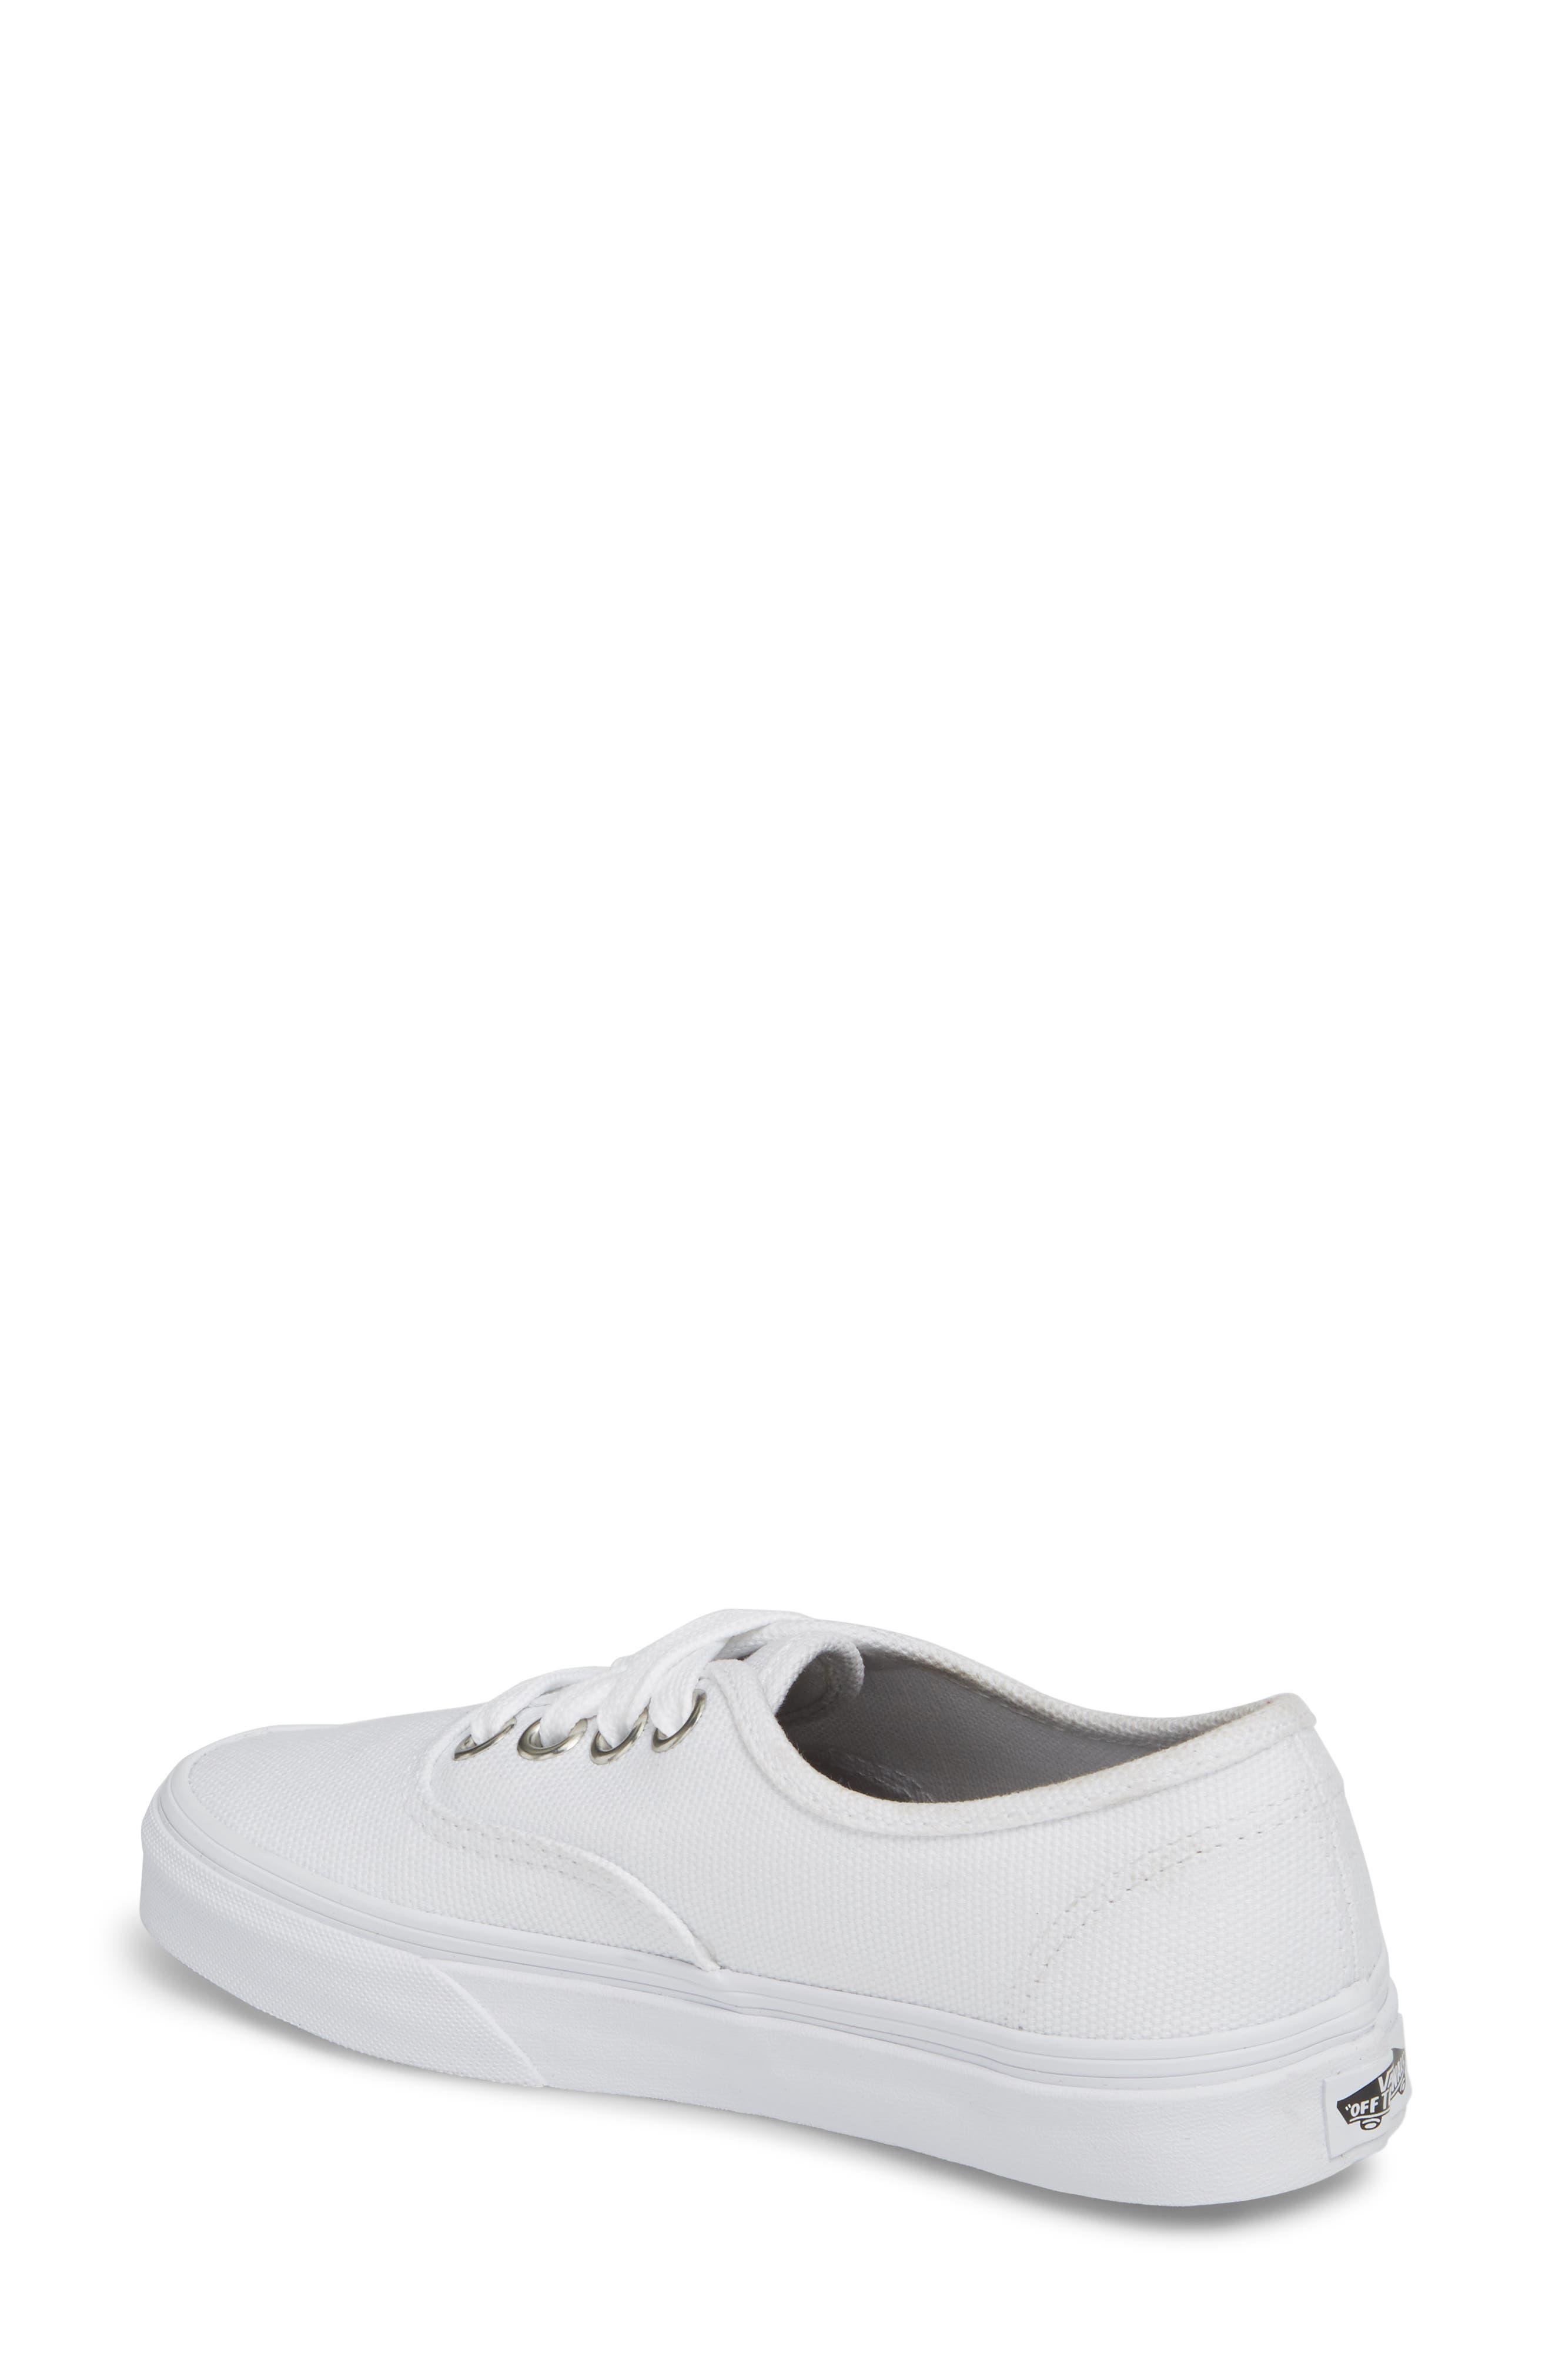 ,                             'Authentic' Sneaker,                             Alternate thumbnail 193, color,                             102